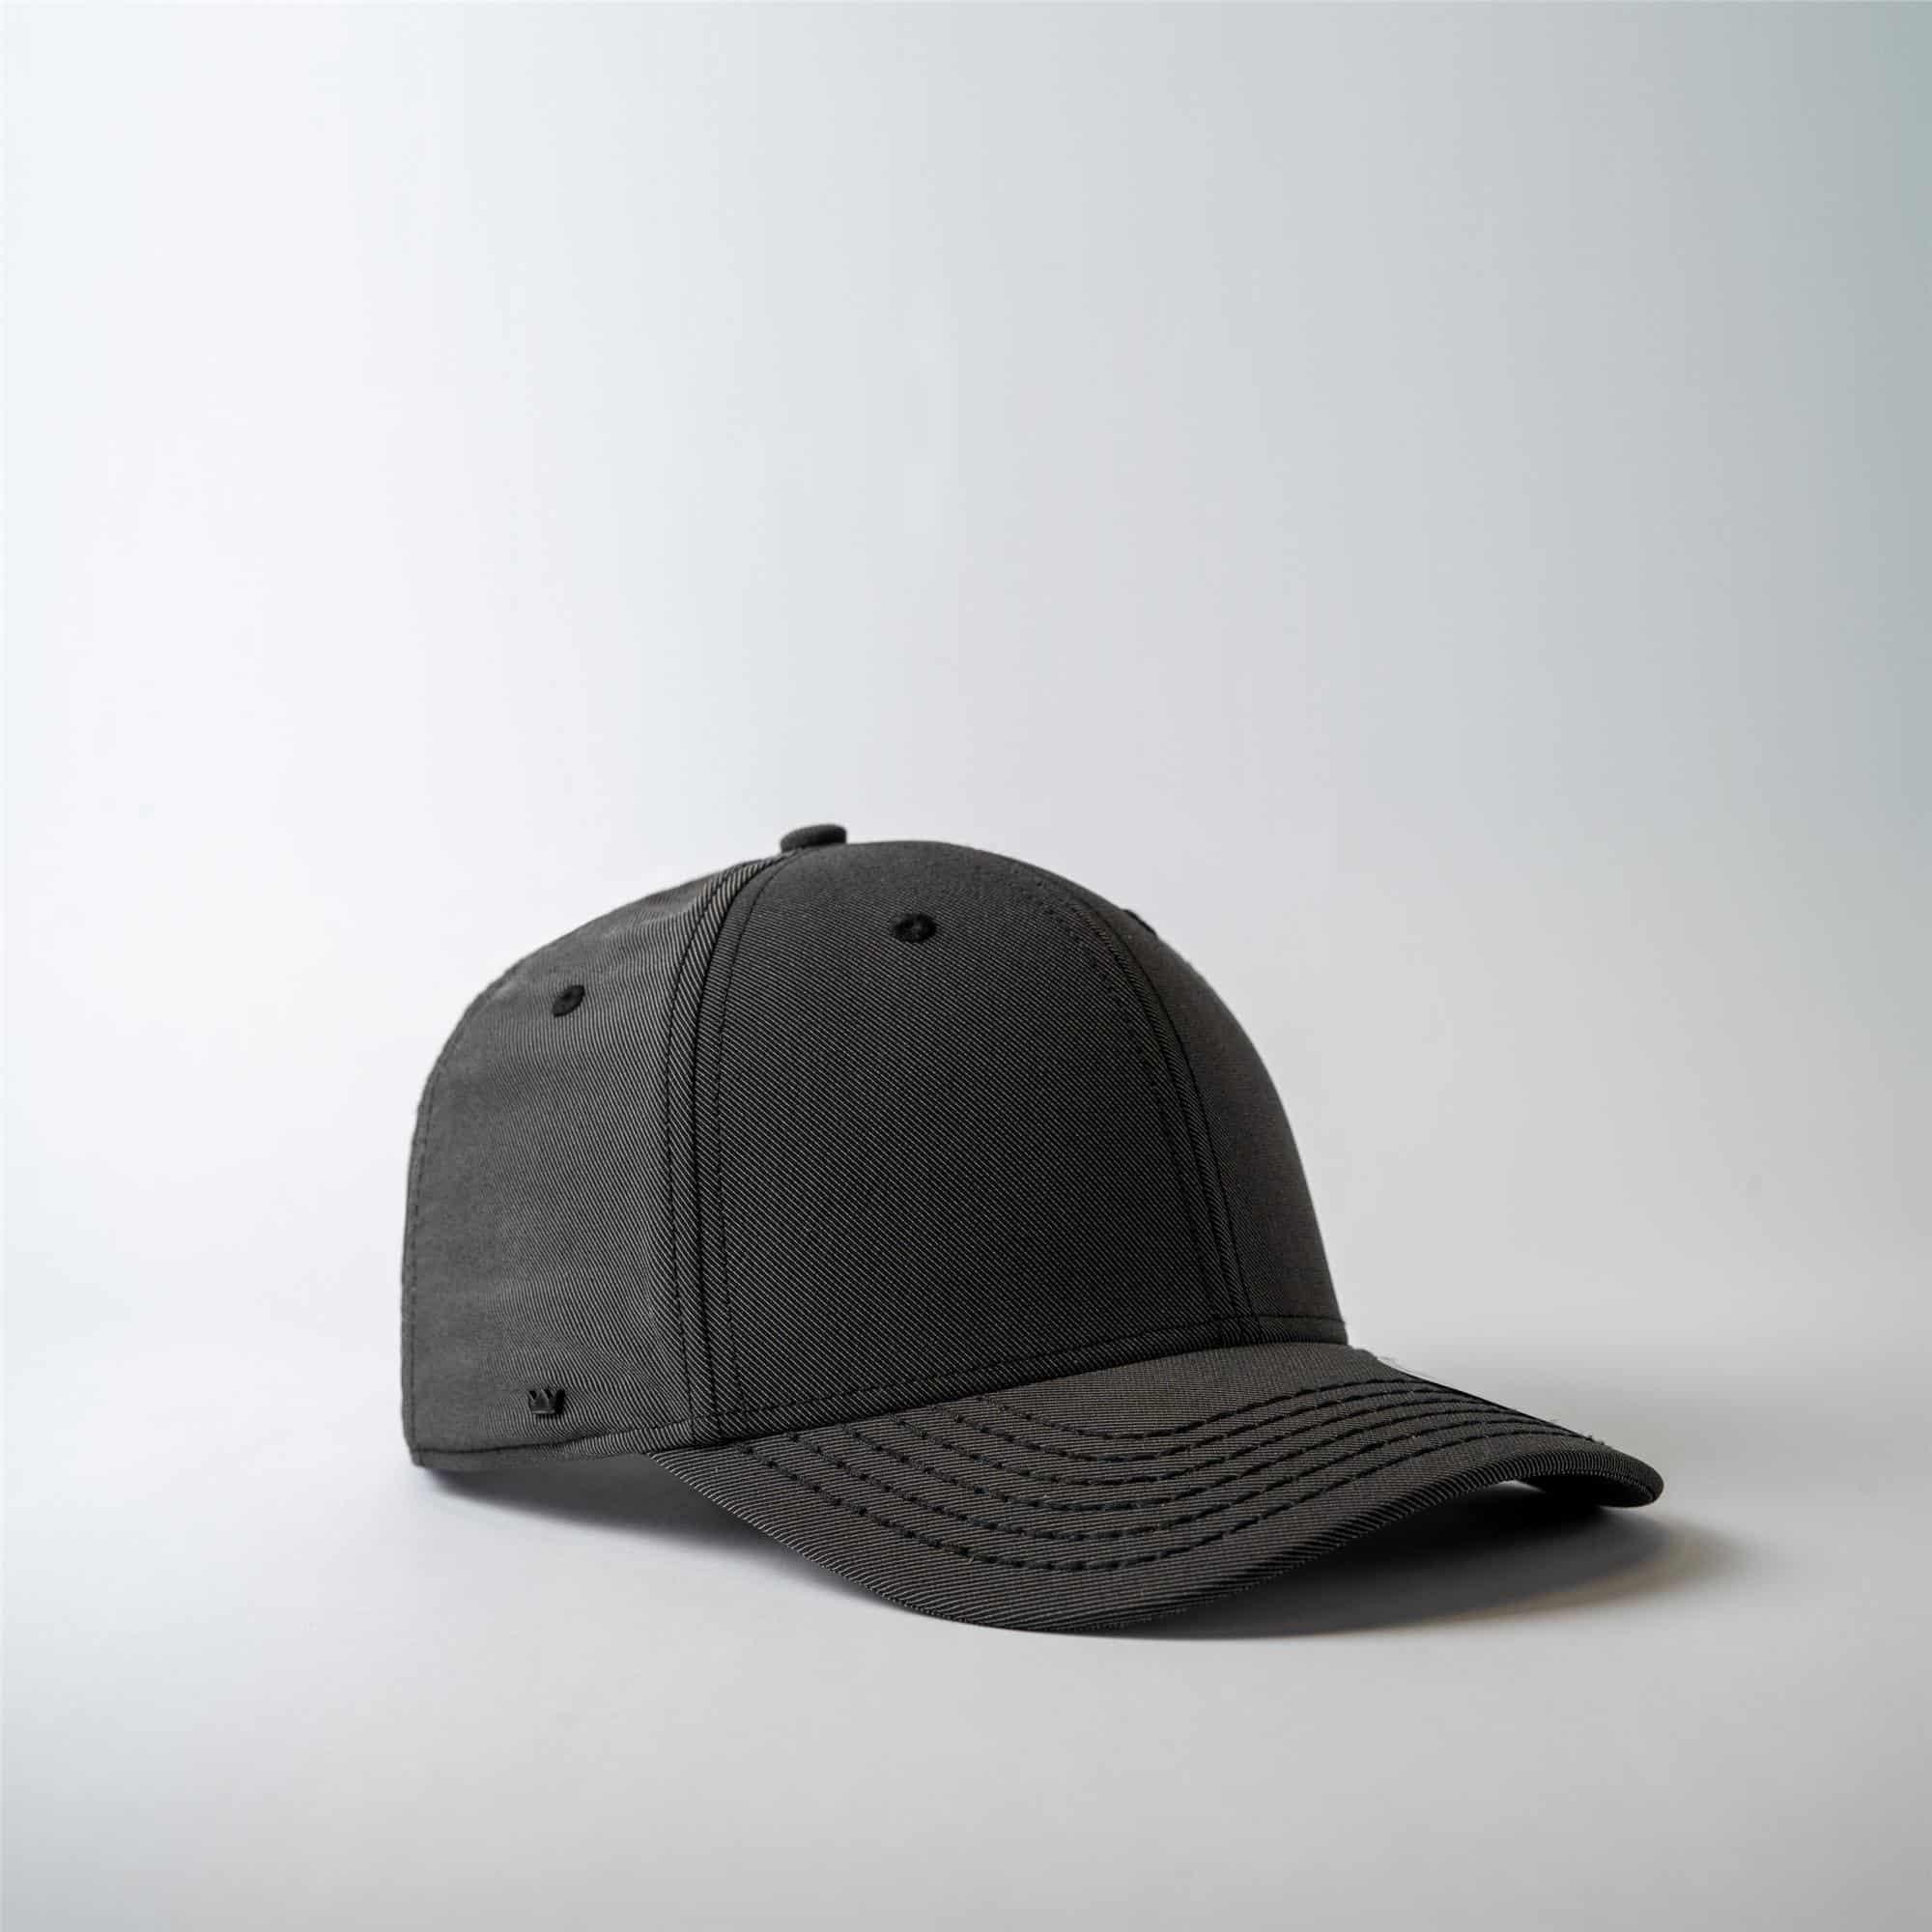 U15613 Spandex Twill 6 Panel Adjustable Headwear and Accessories